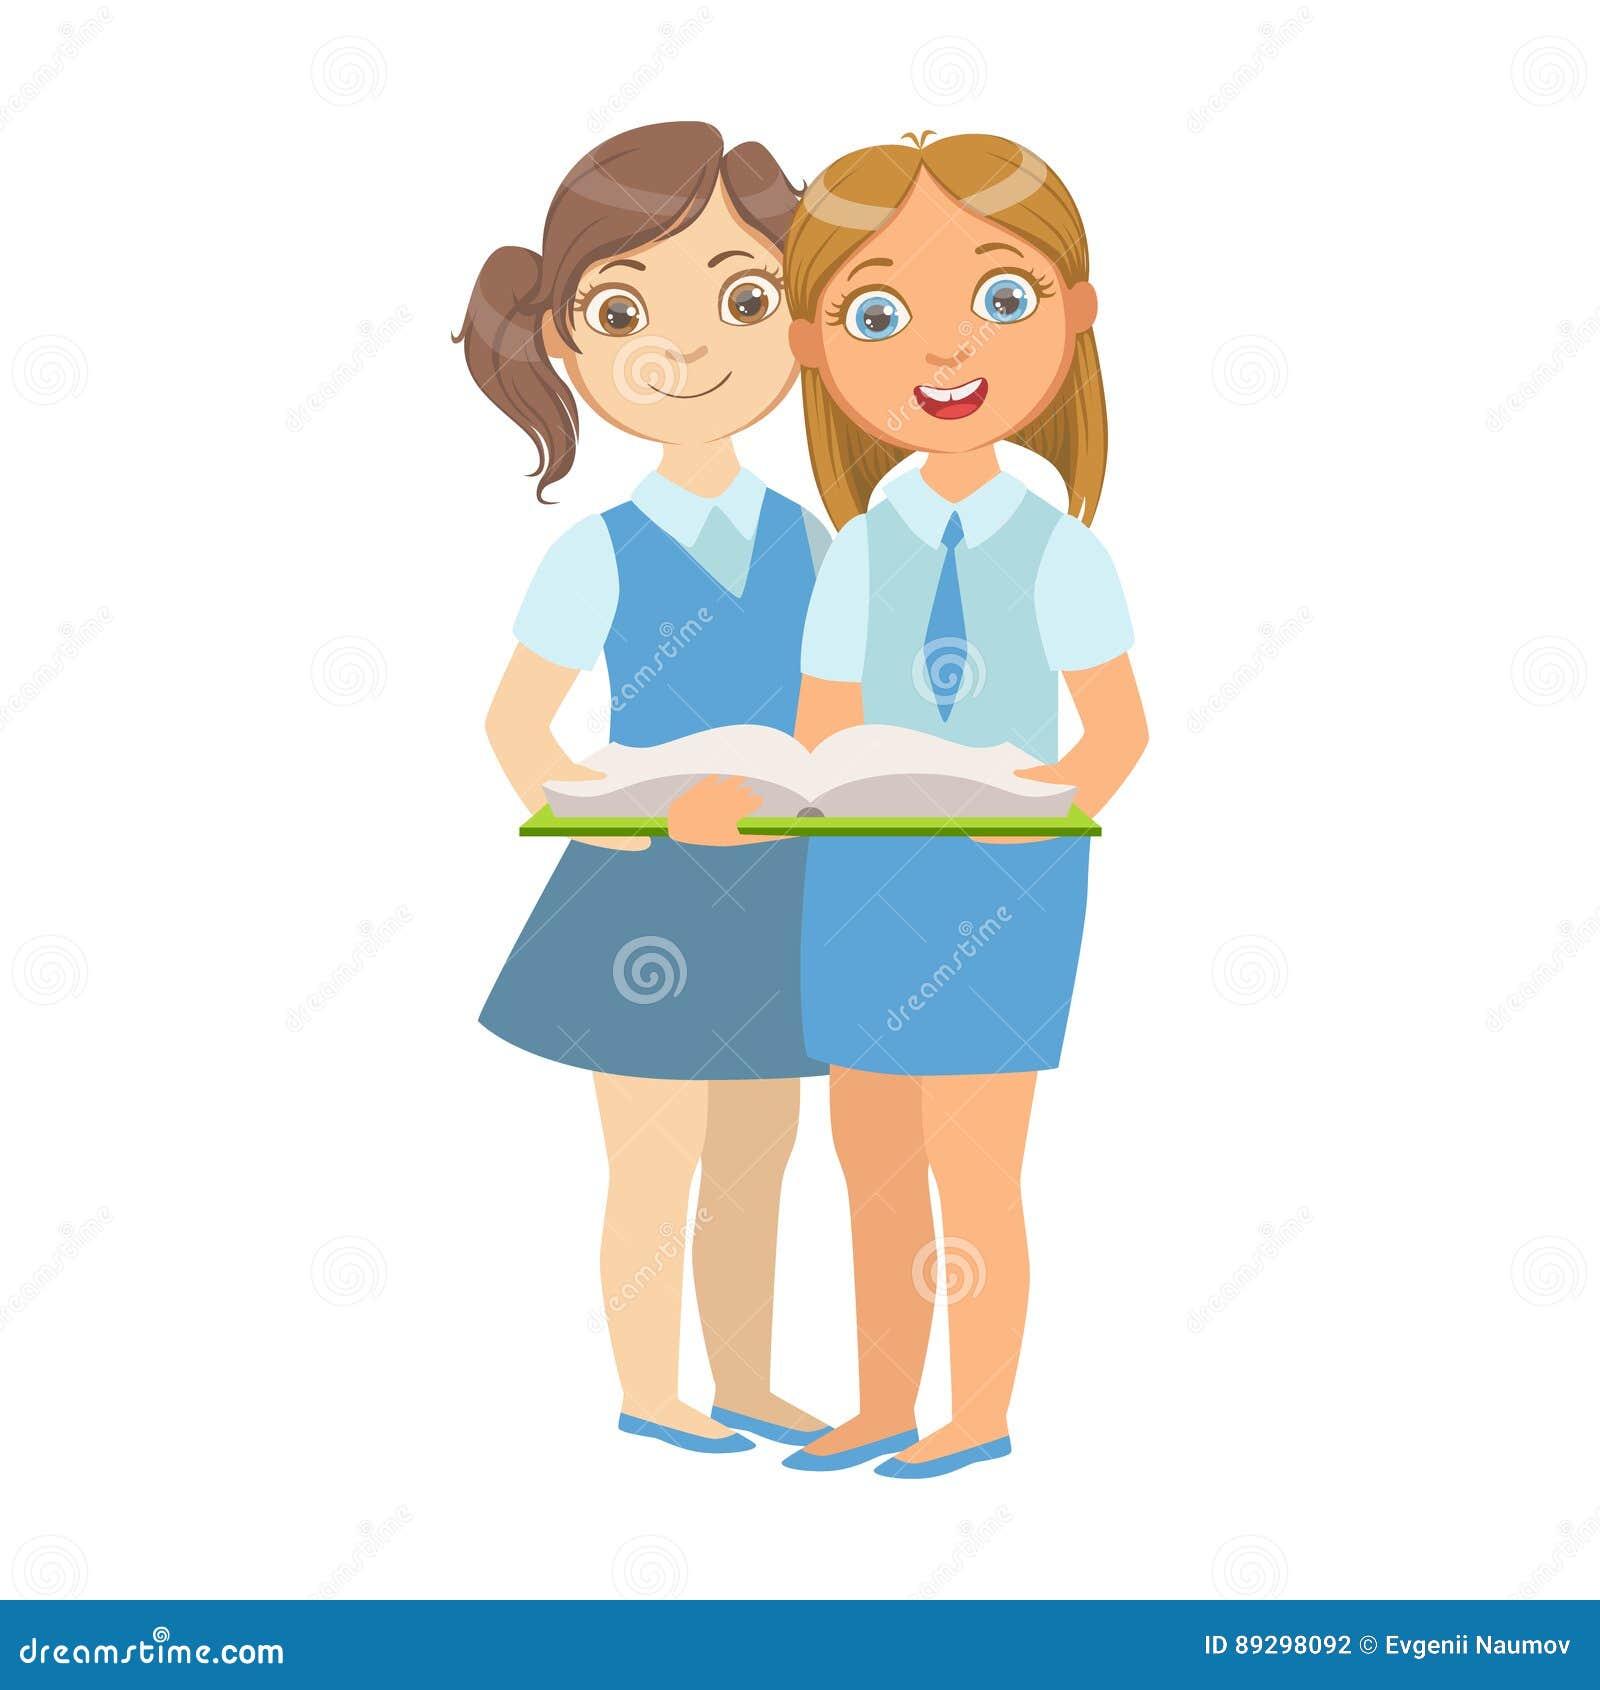 Book Cover School Uniform : Cartoon kids reading book vector